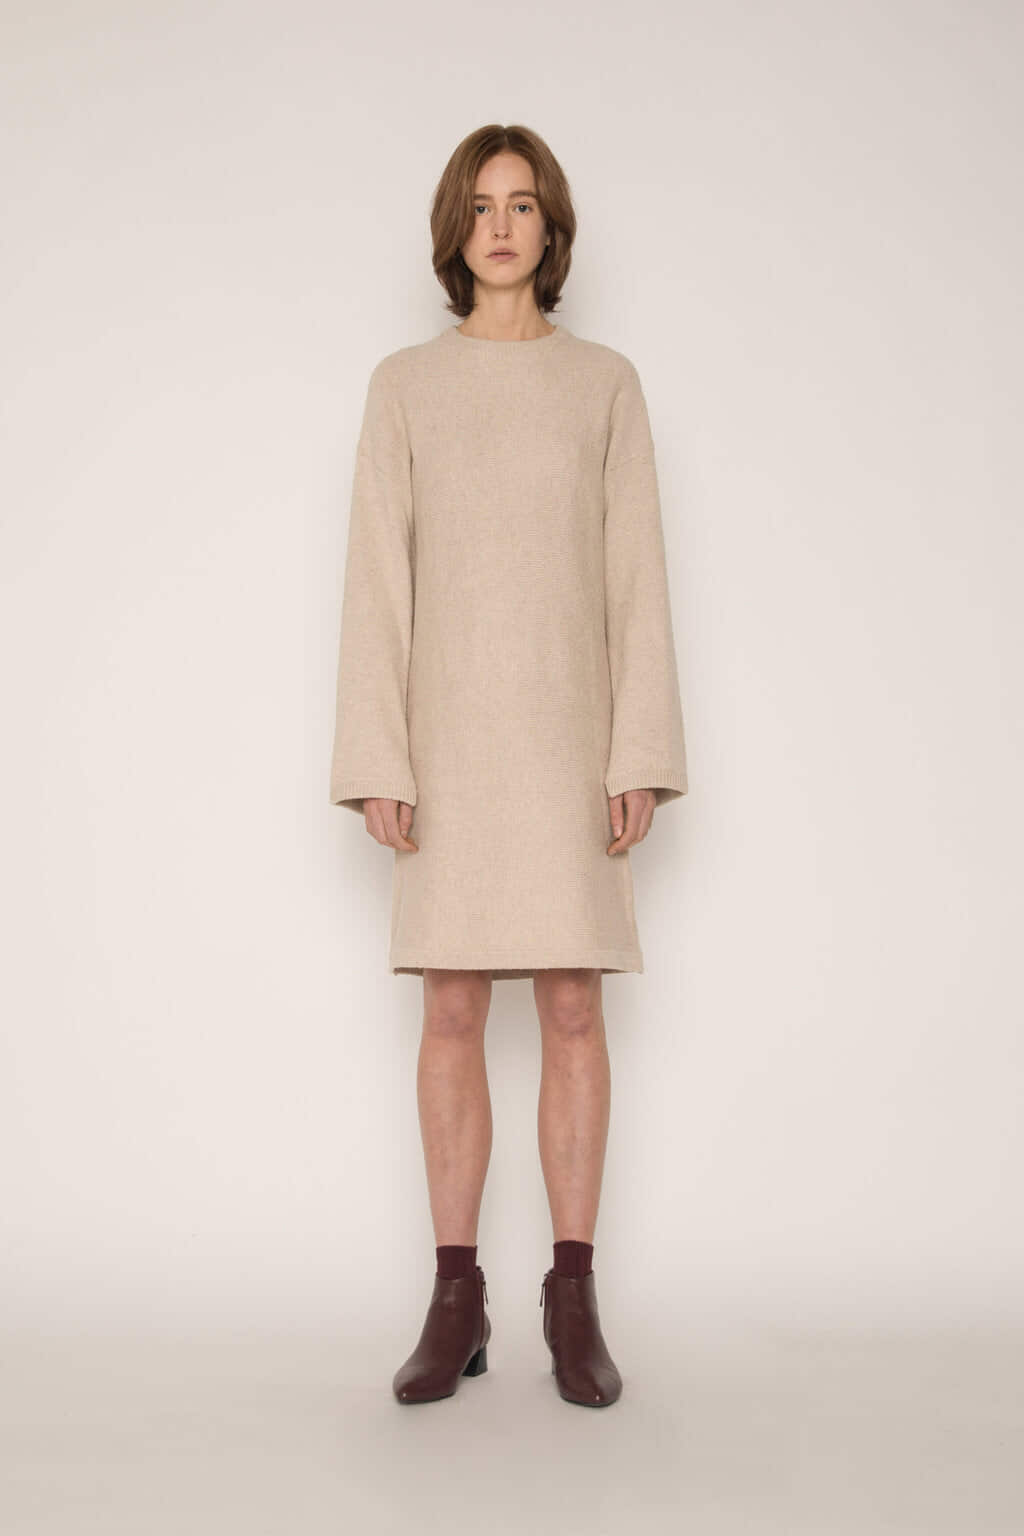 Dress 1817 Oatmeal 2